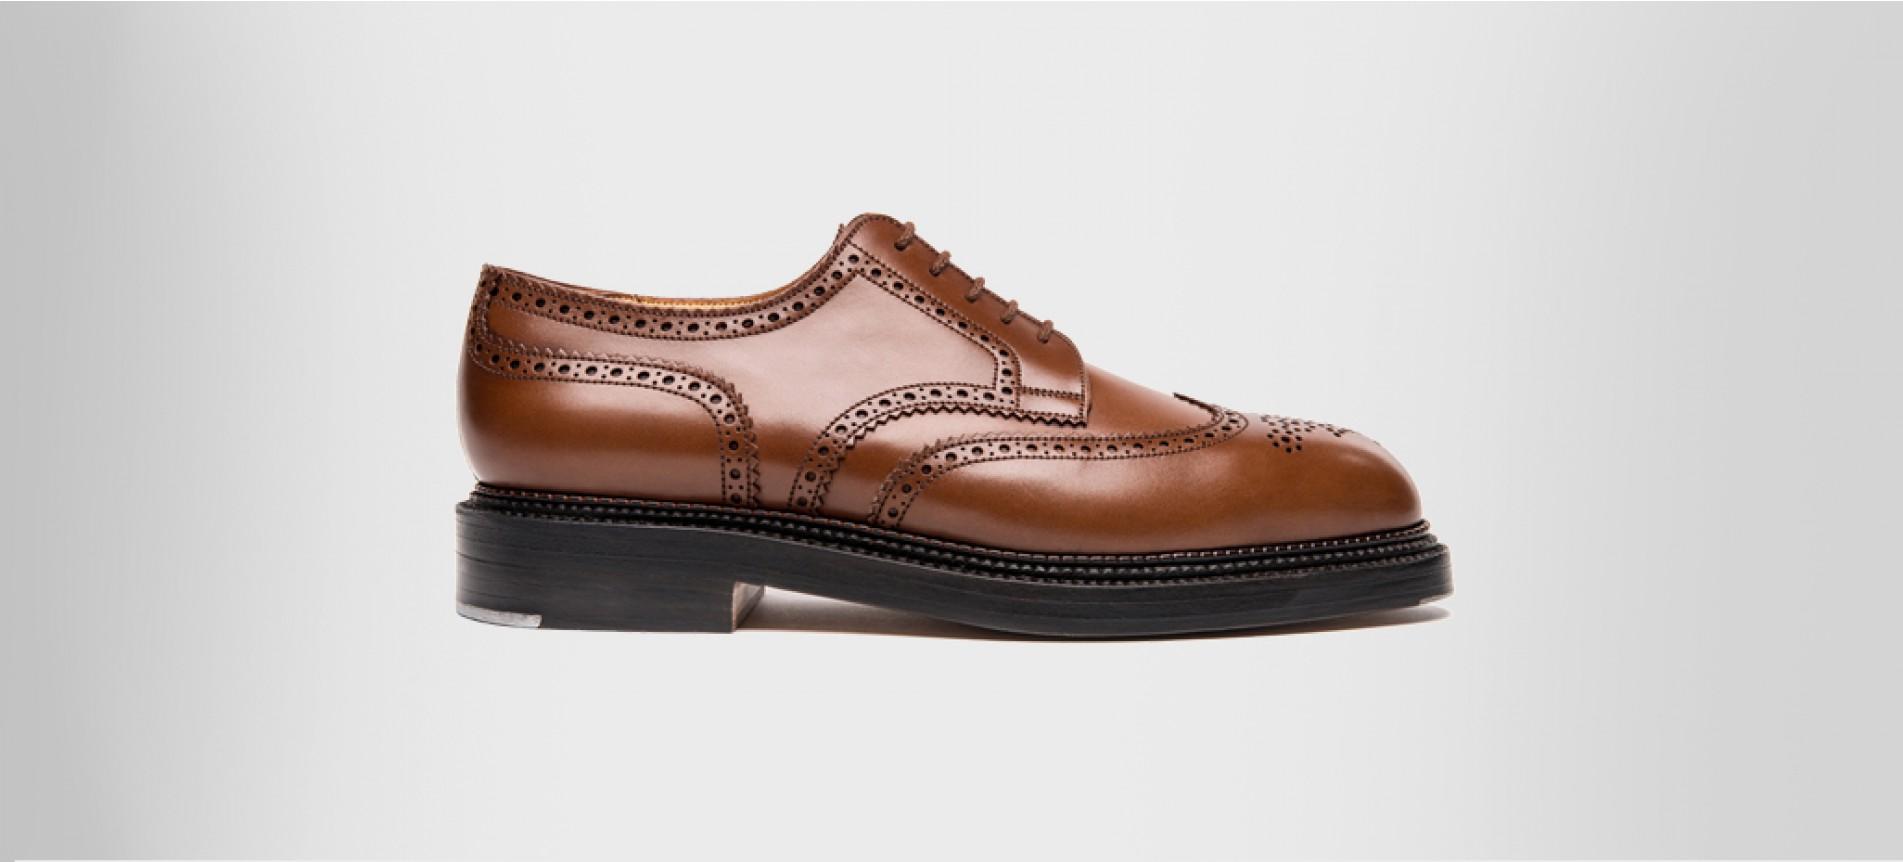 Triple sole derby Brown boxcalf